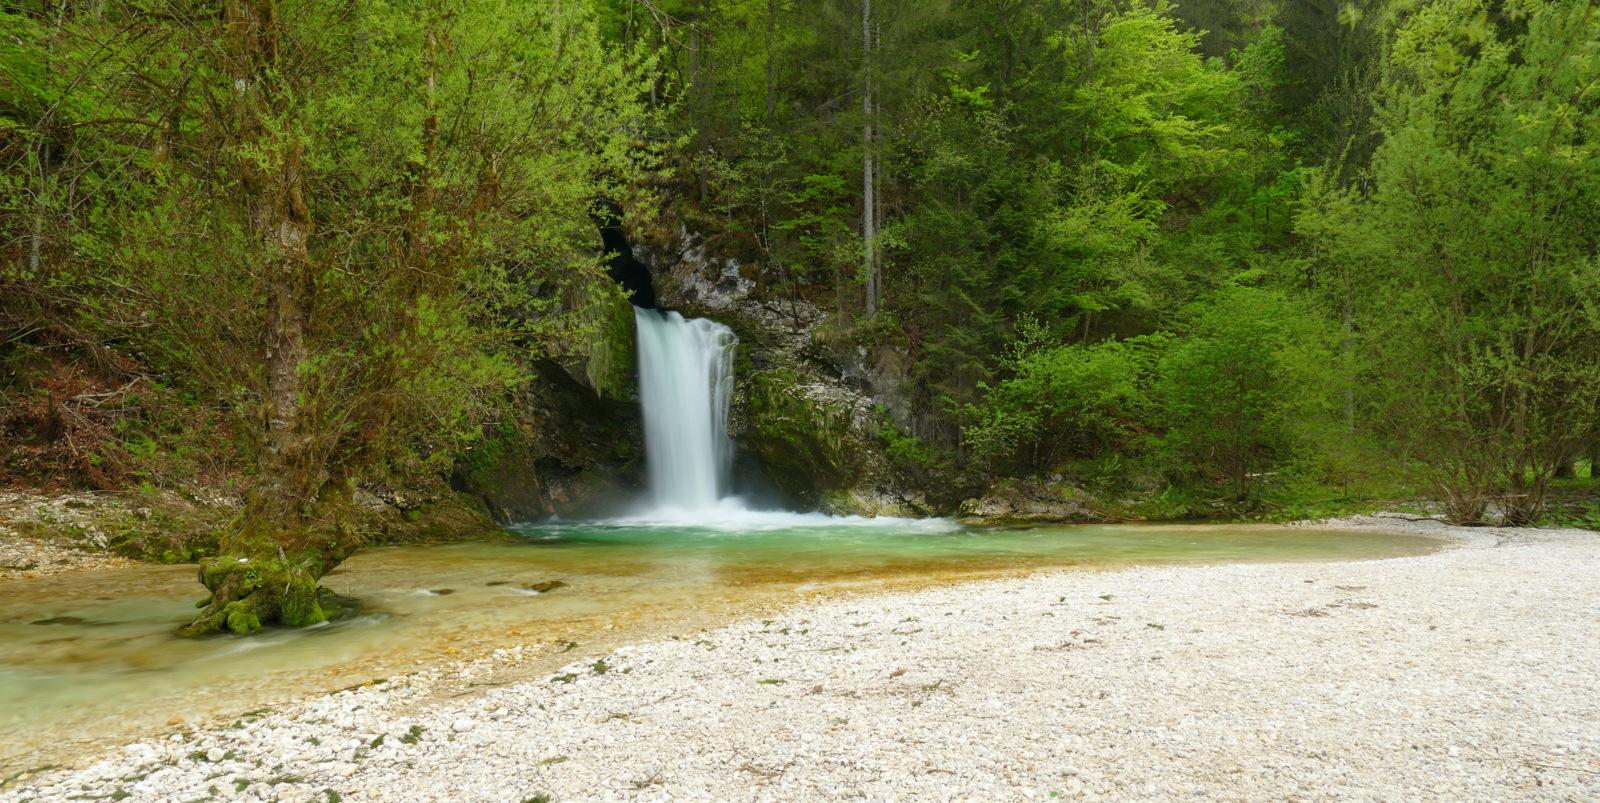 Waterfall Grmečica, Slovenia